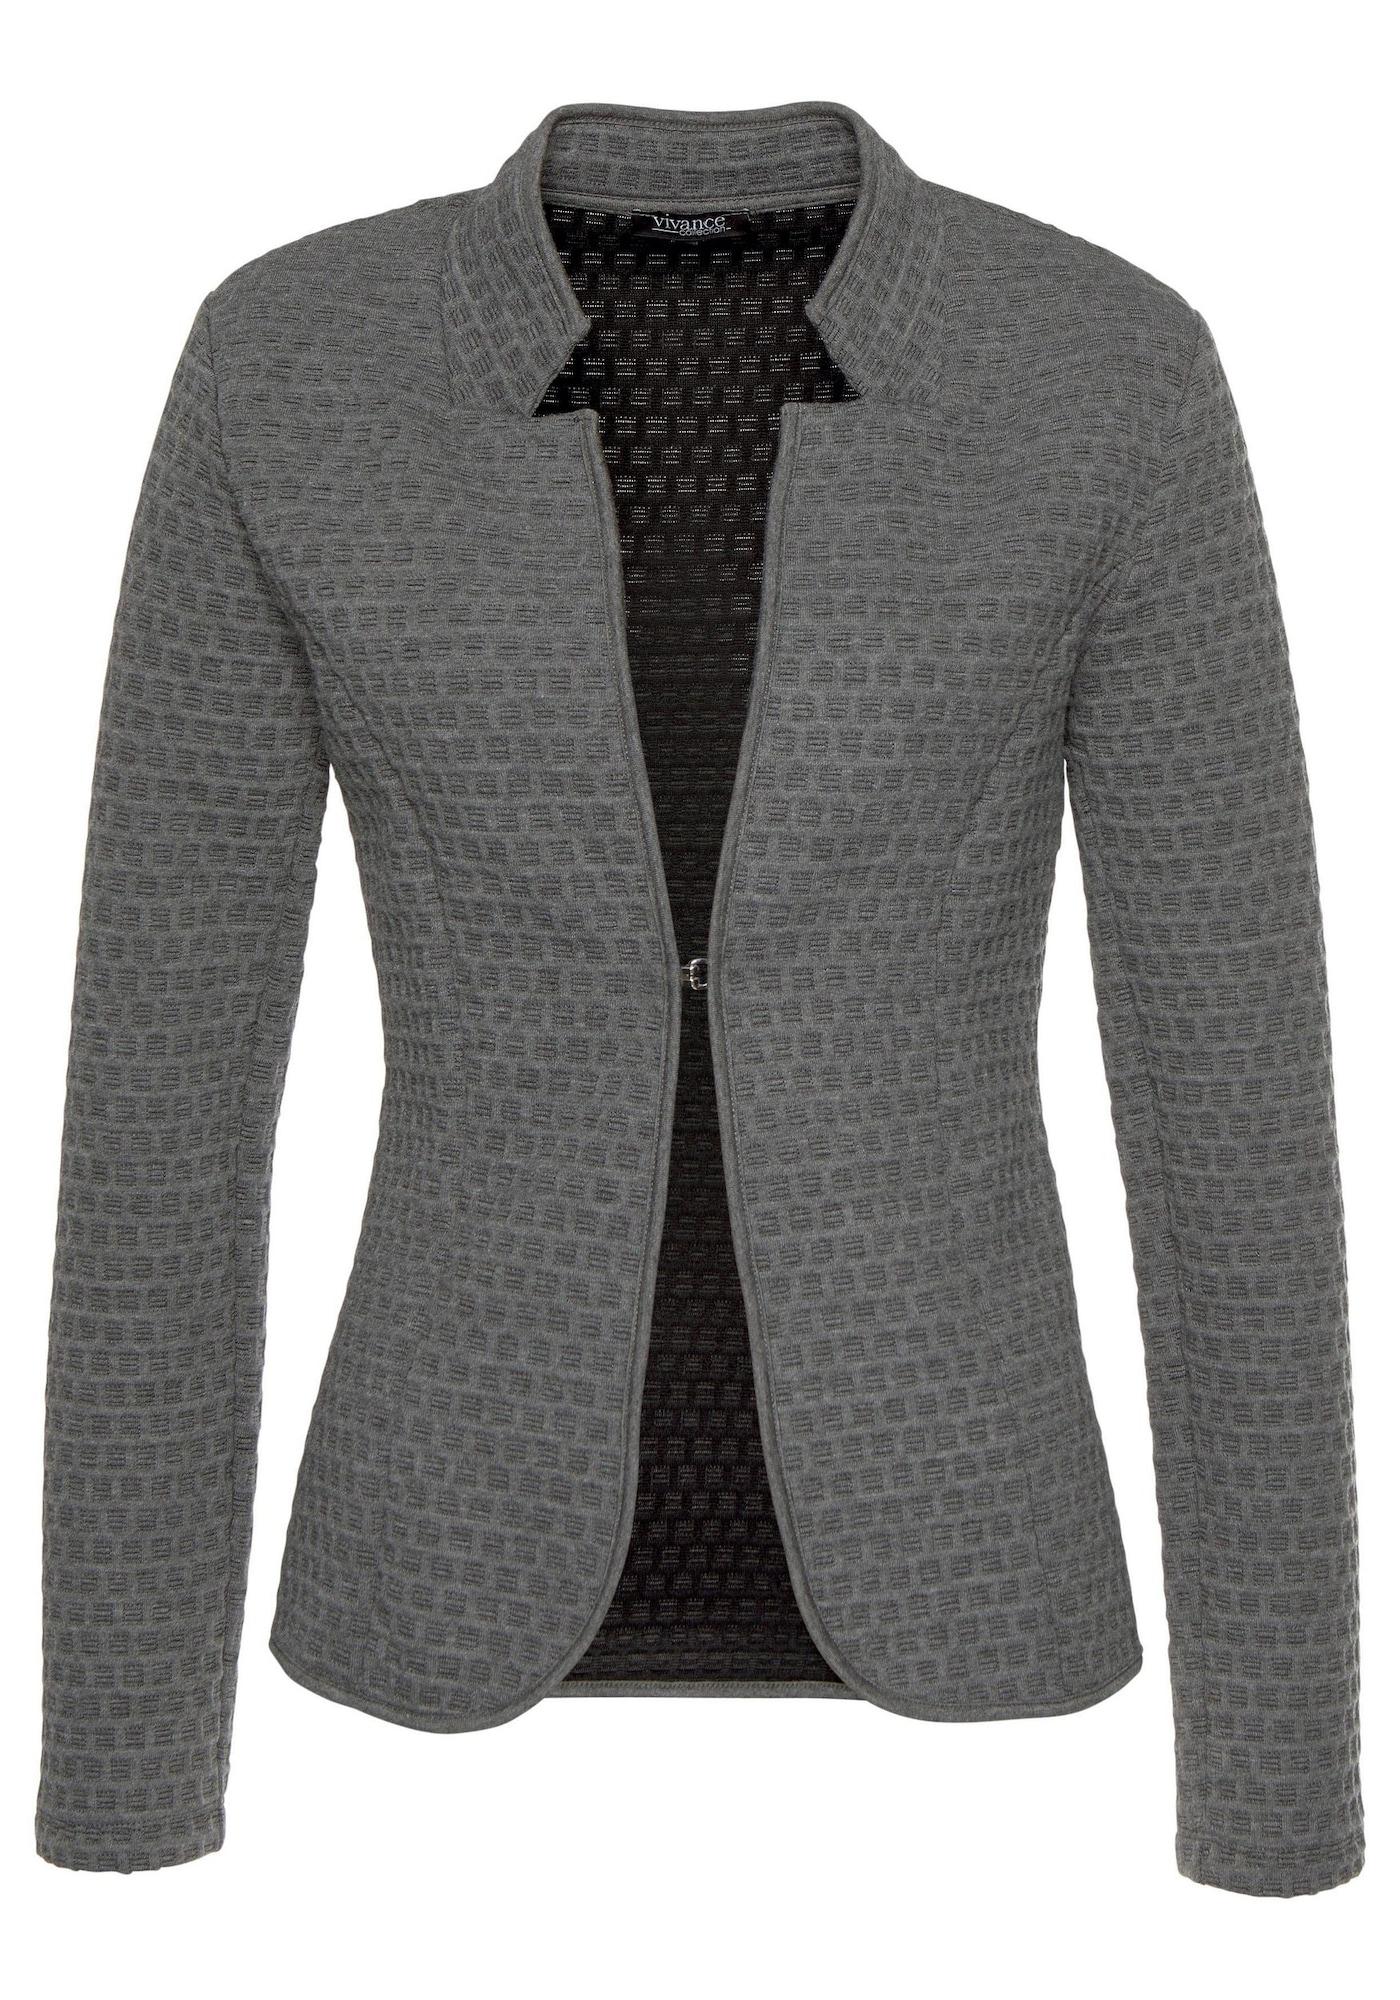 Jackenblazer | Bekleidung > Blazer > Jackenblazer | Grau | VIVANCE